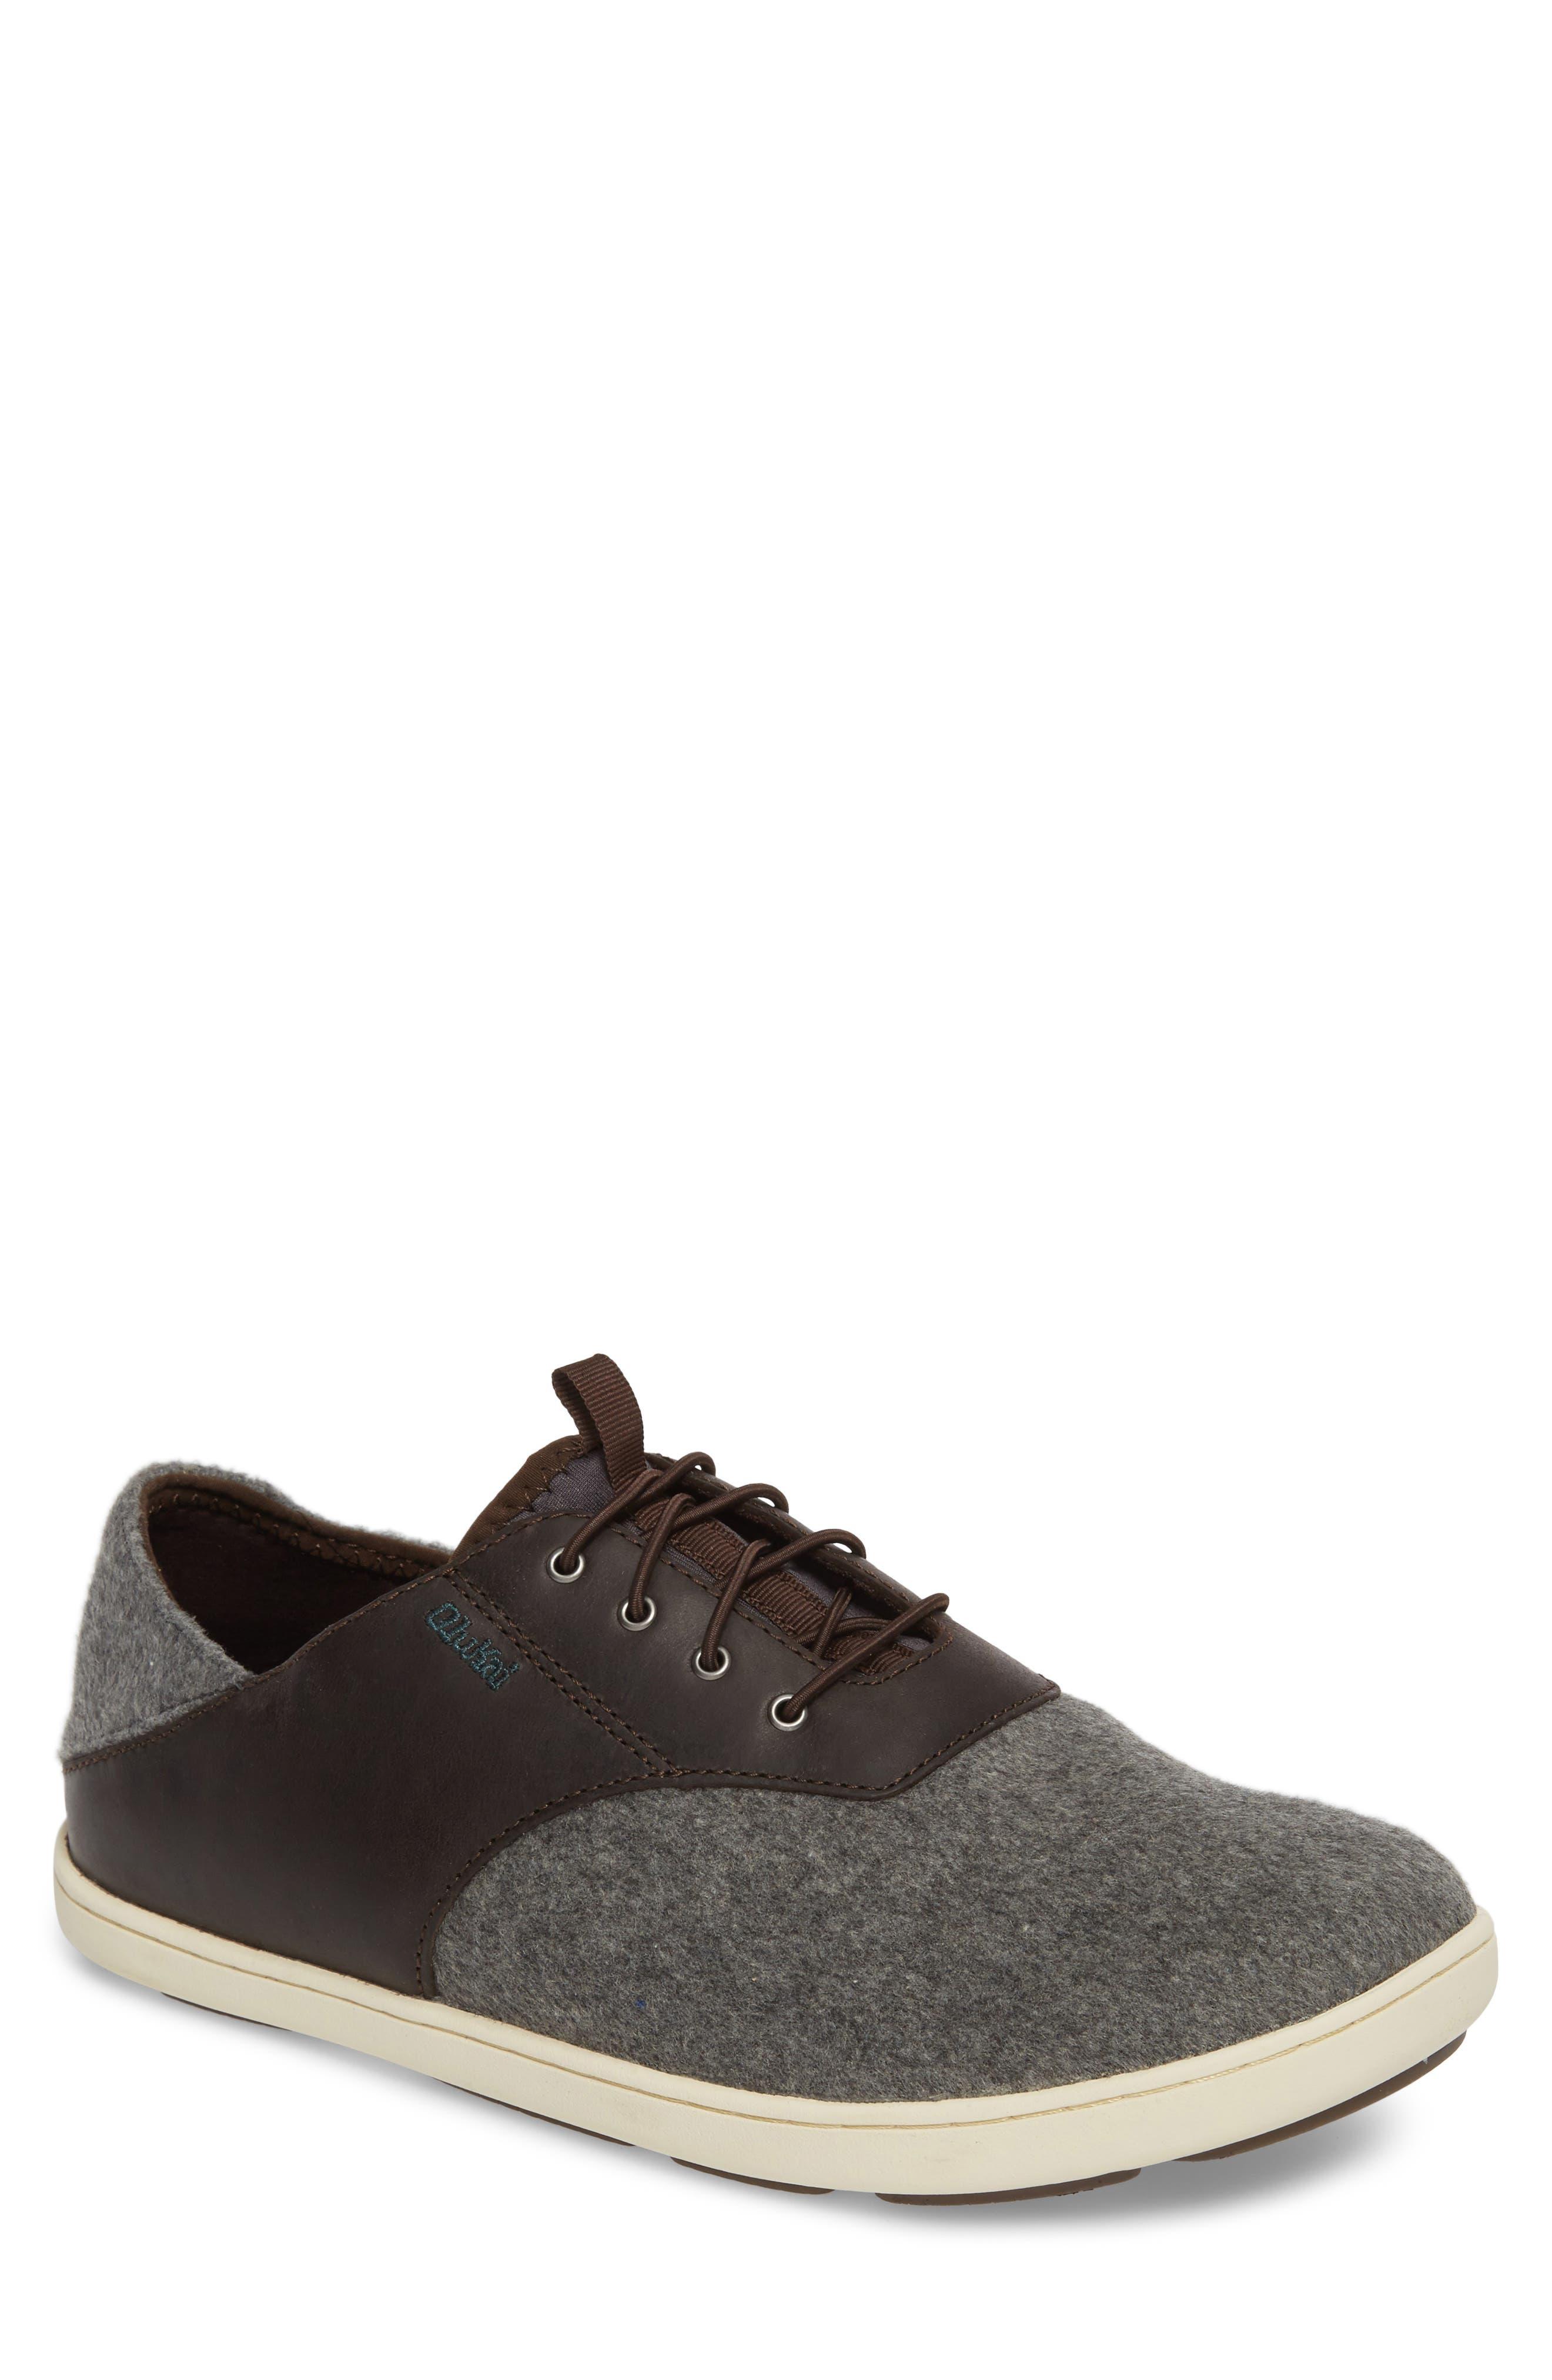 Alternate Image 1 Selected - OluKai Nohea Moku Hulu Sneaker (Men)